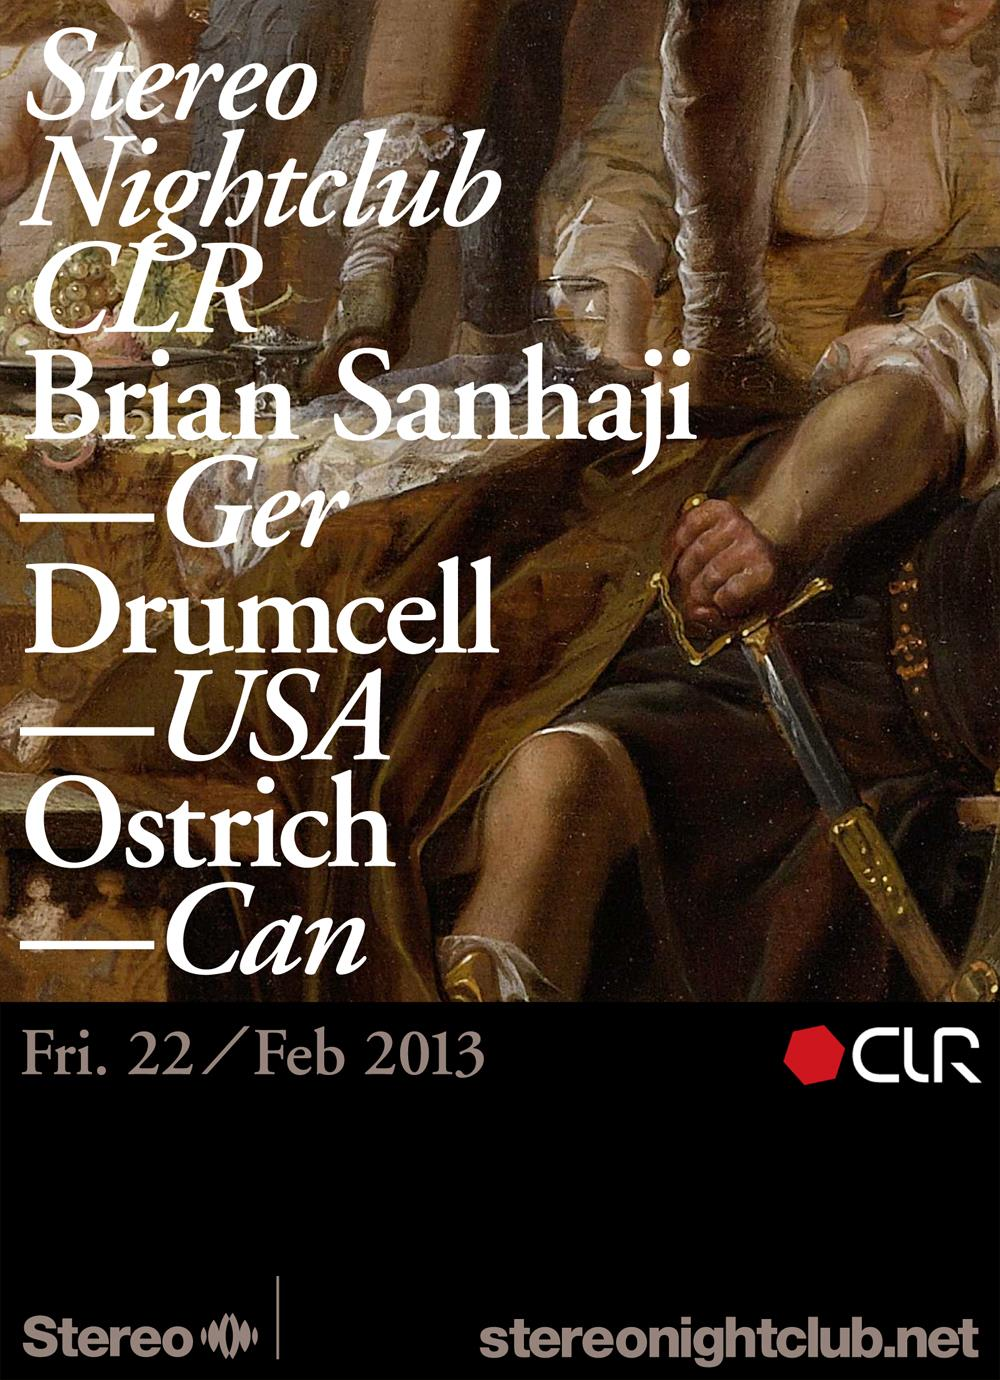 Brian Sanhaji, Drumcell, Ostrich Stereo Montreal